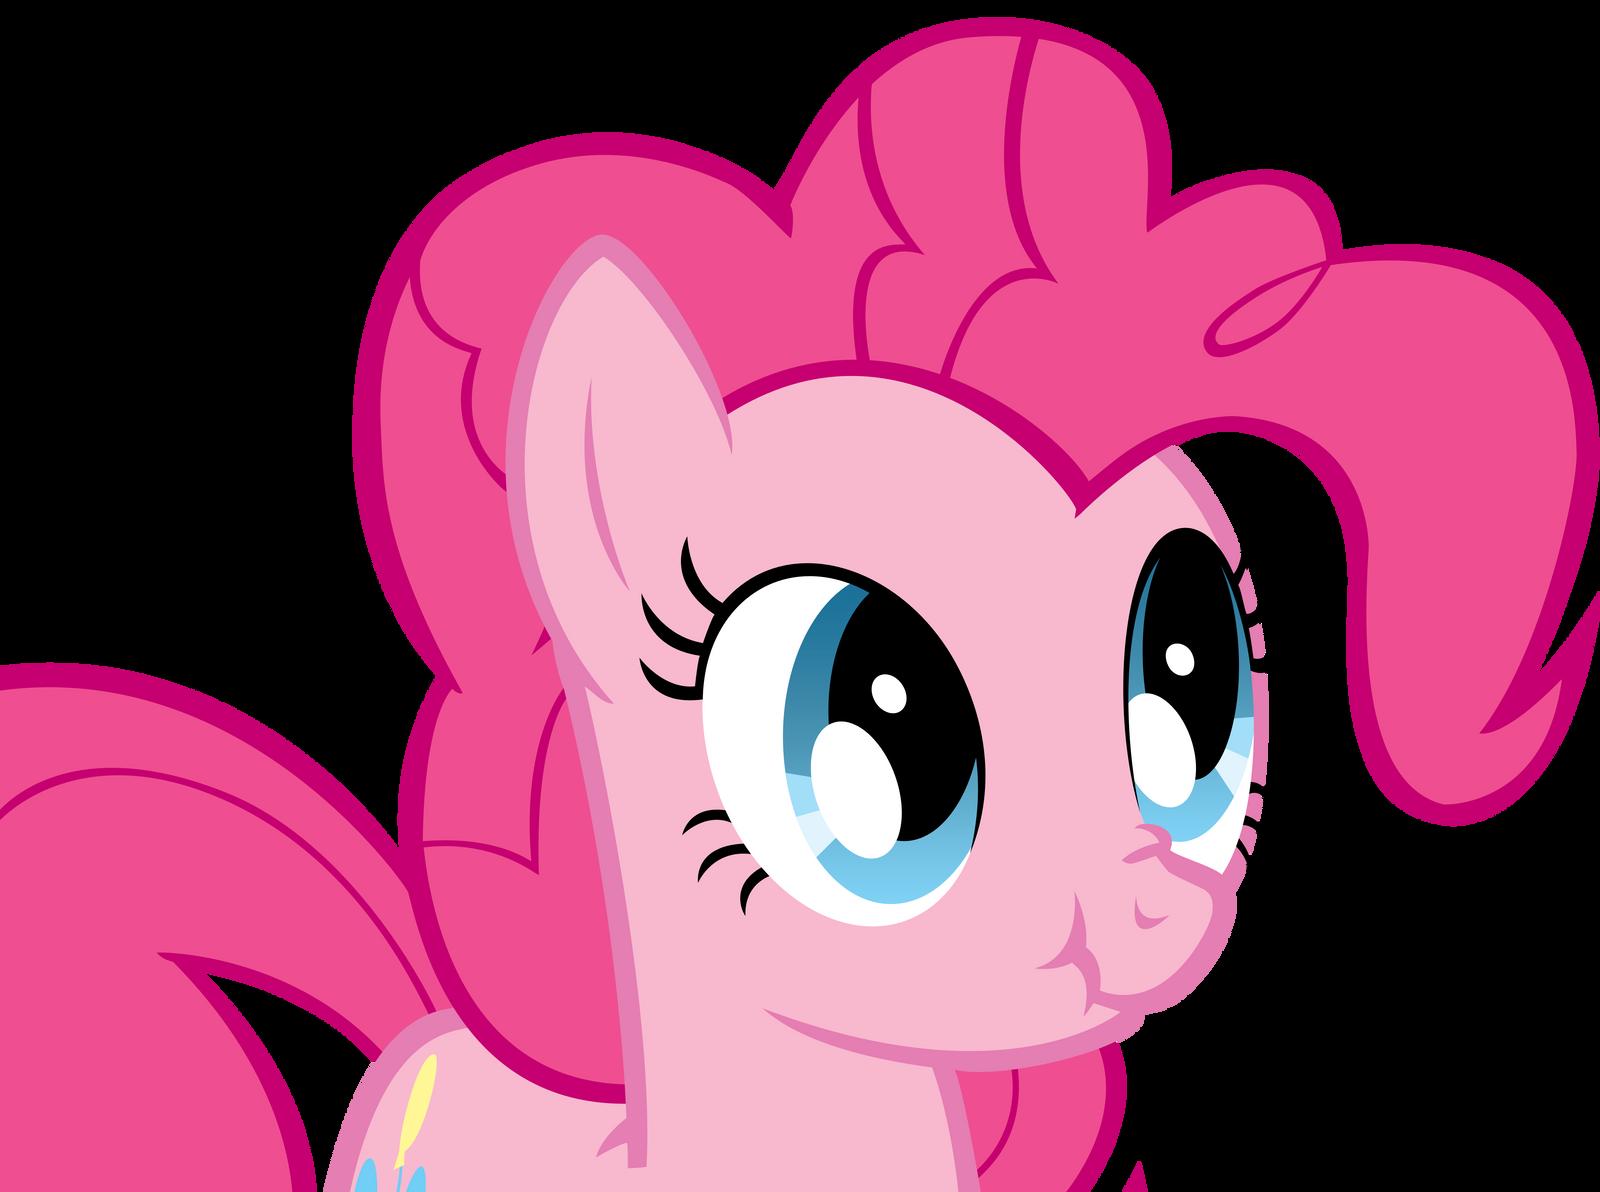 Pinkie Pie Scrunchy Face by Koeper